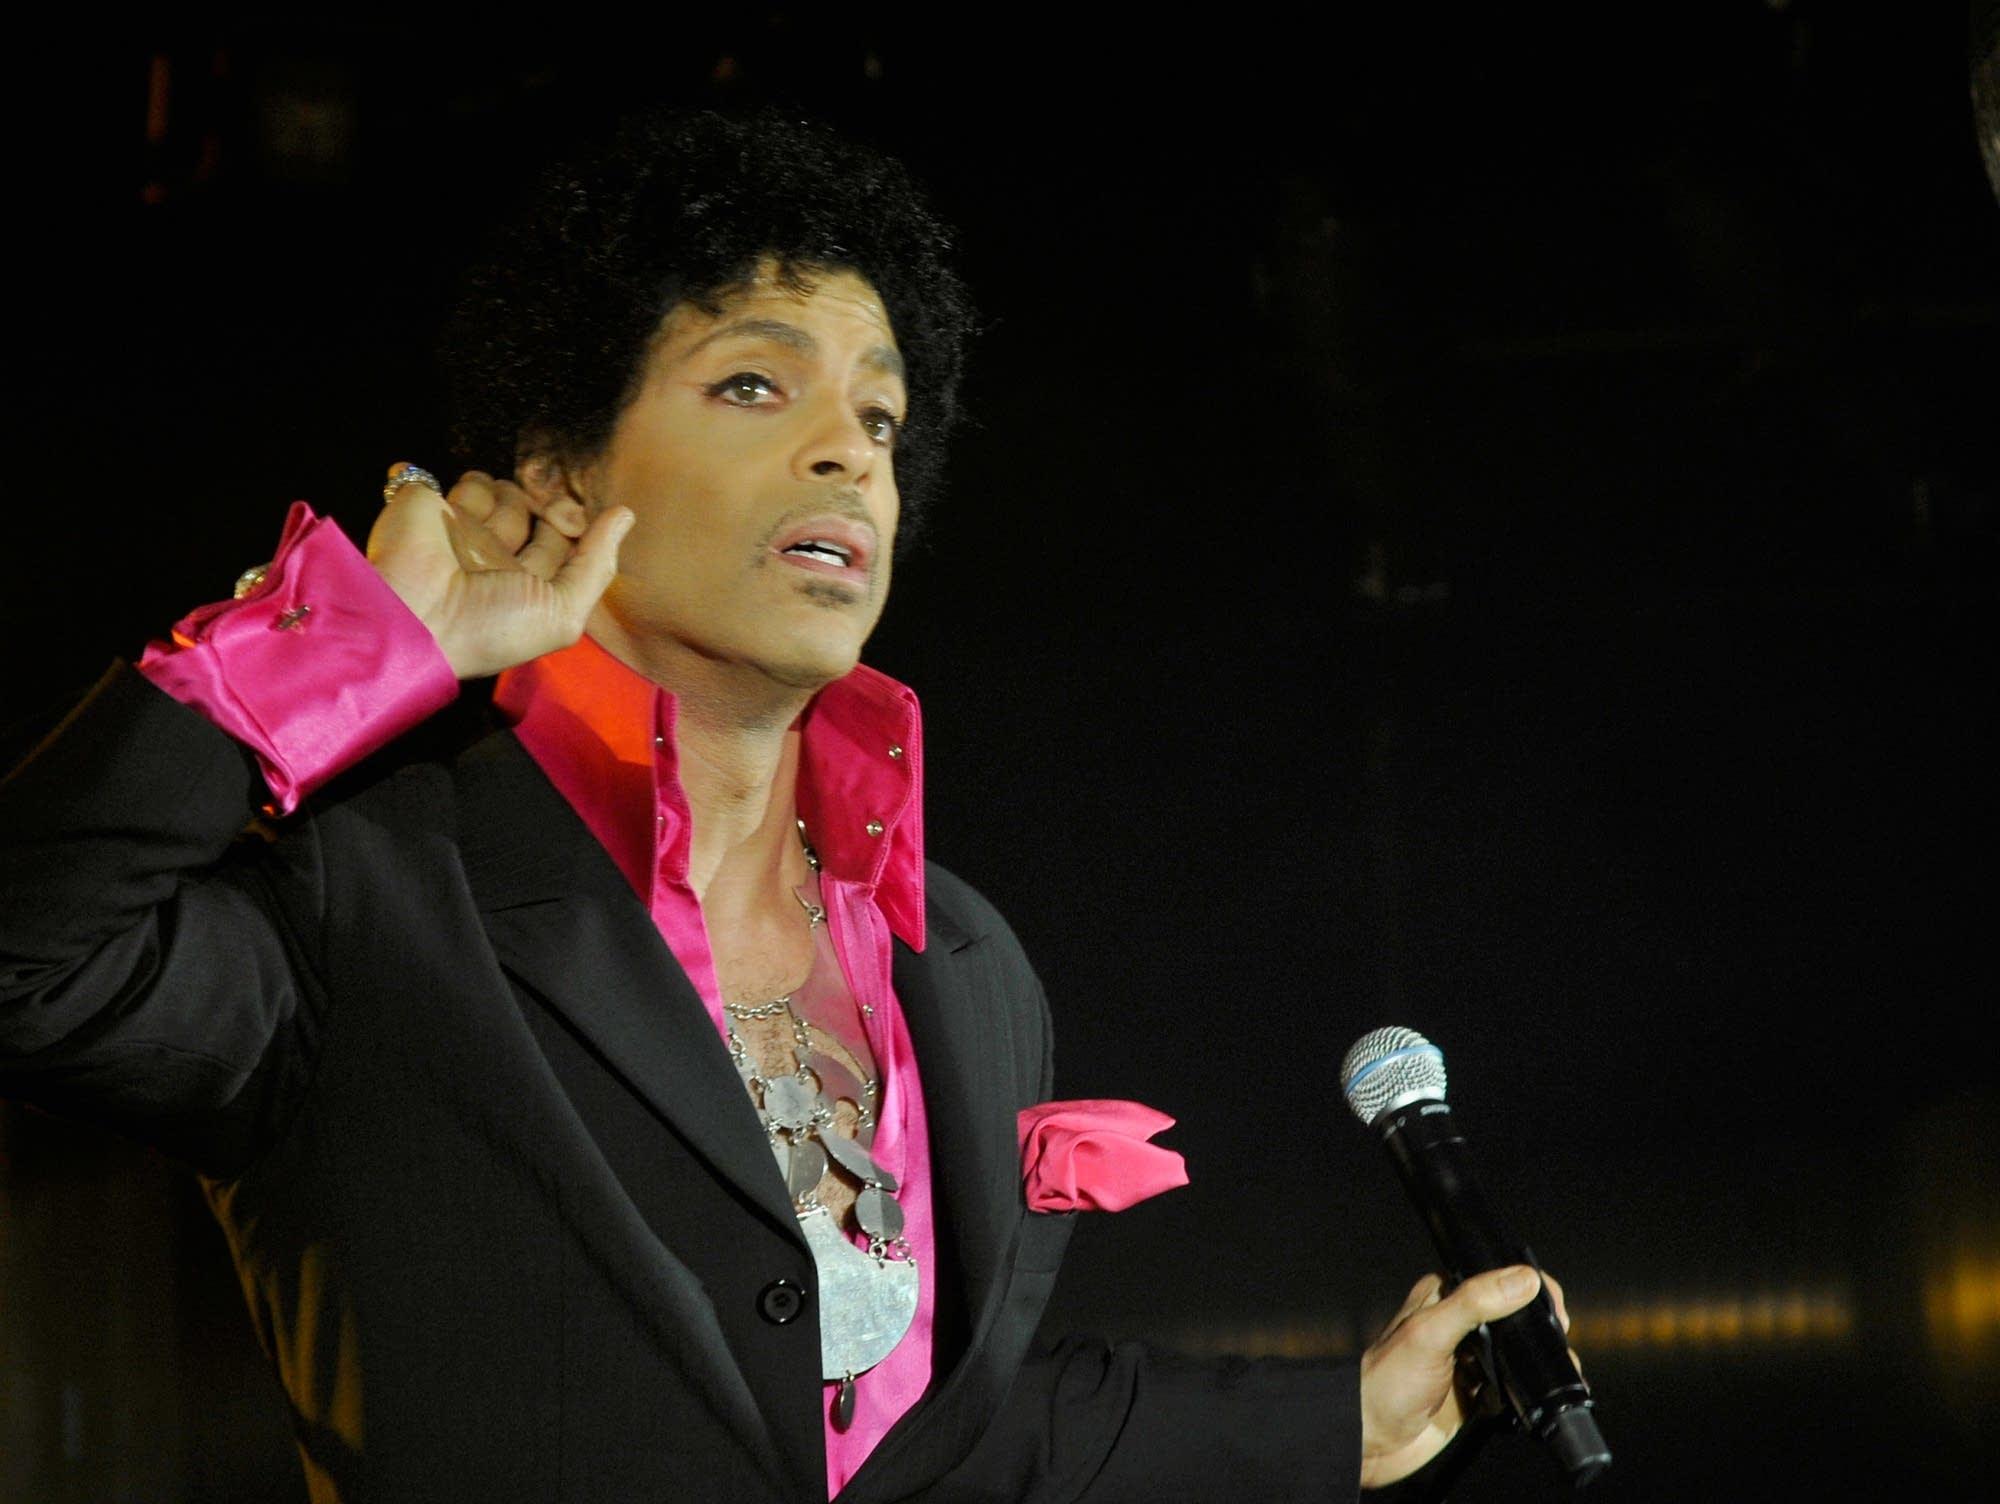 Prince at SXSW 2013